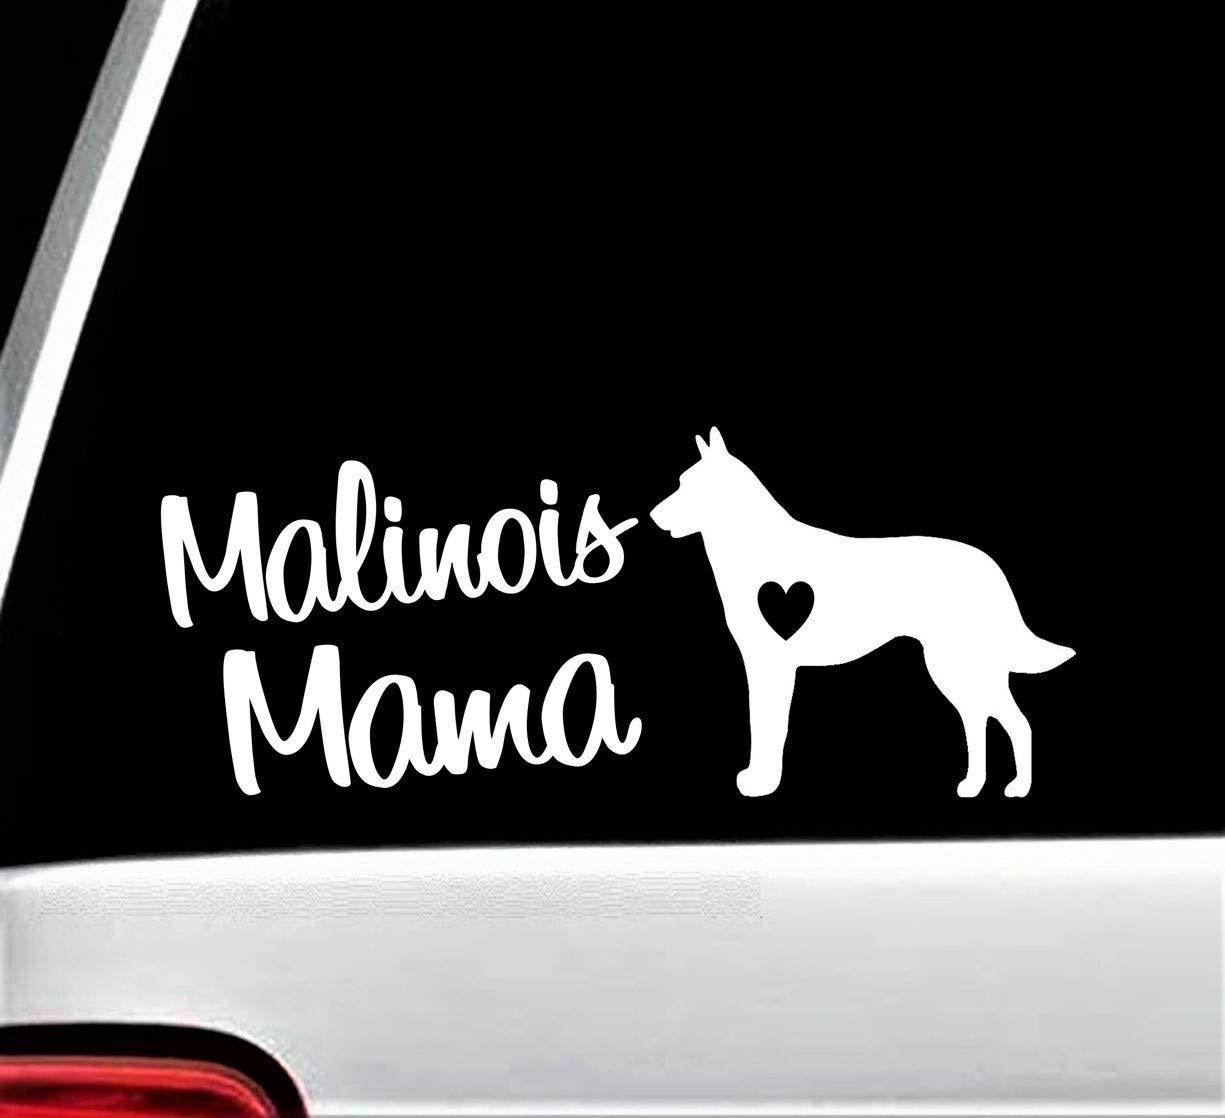 Malinois Mama Decal Sticker for Car Window 8 Inch BG 165